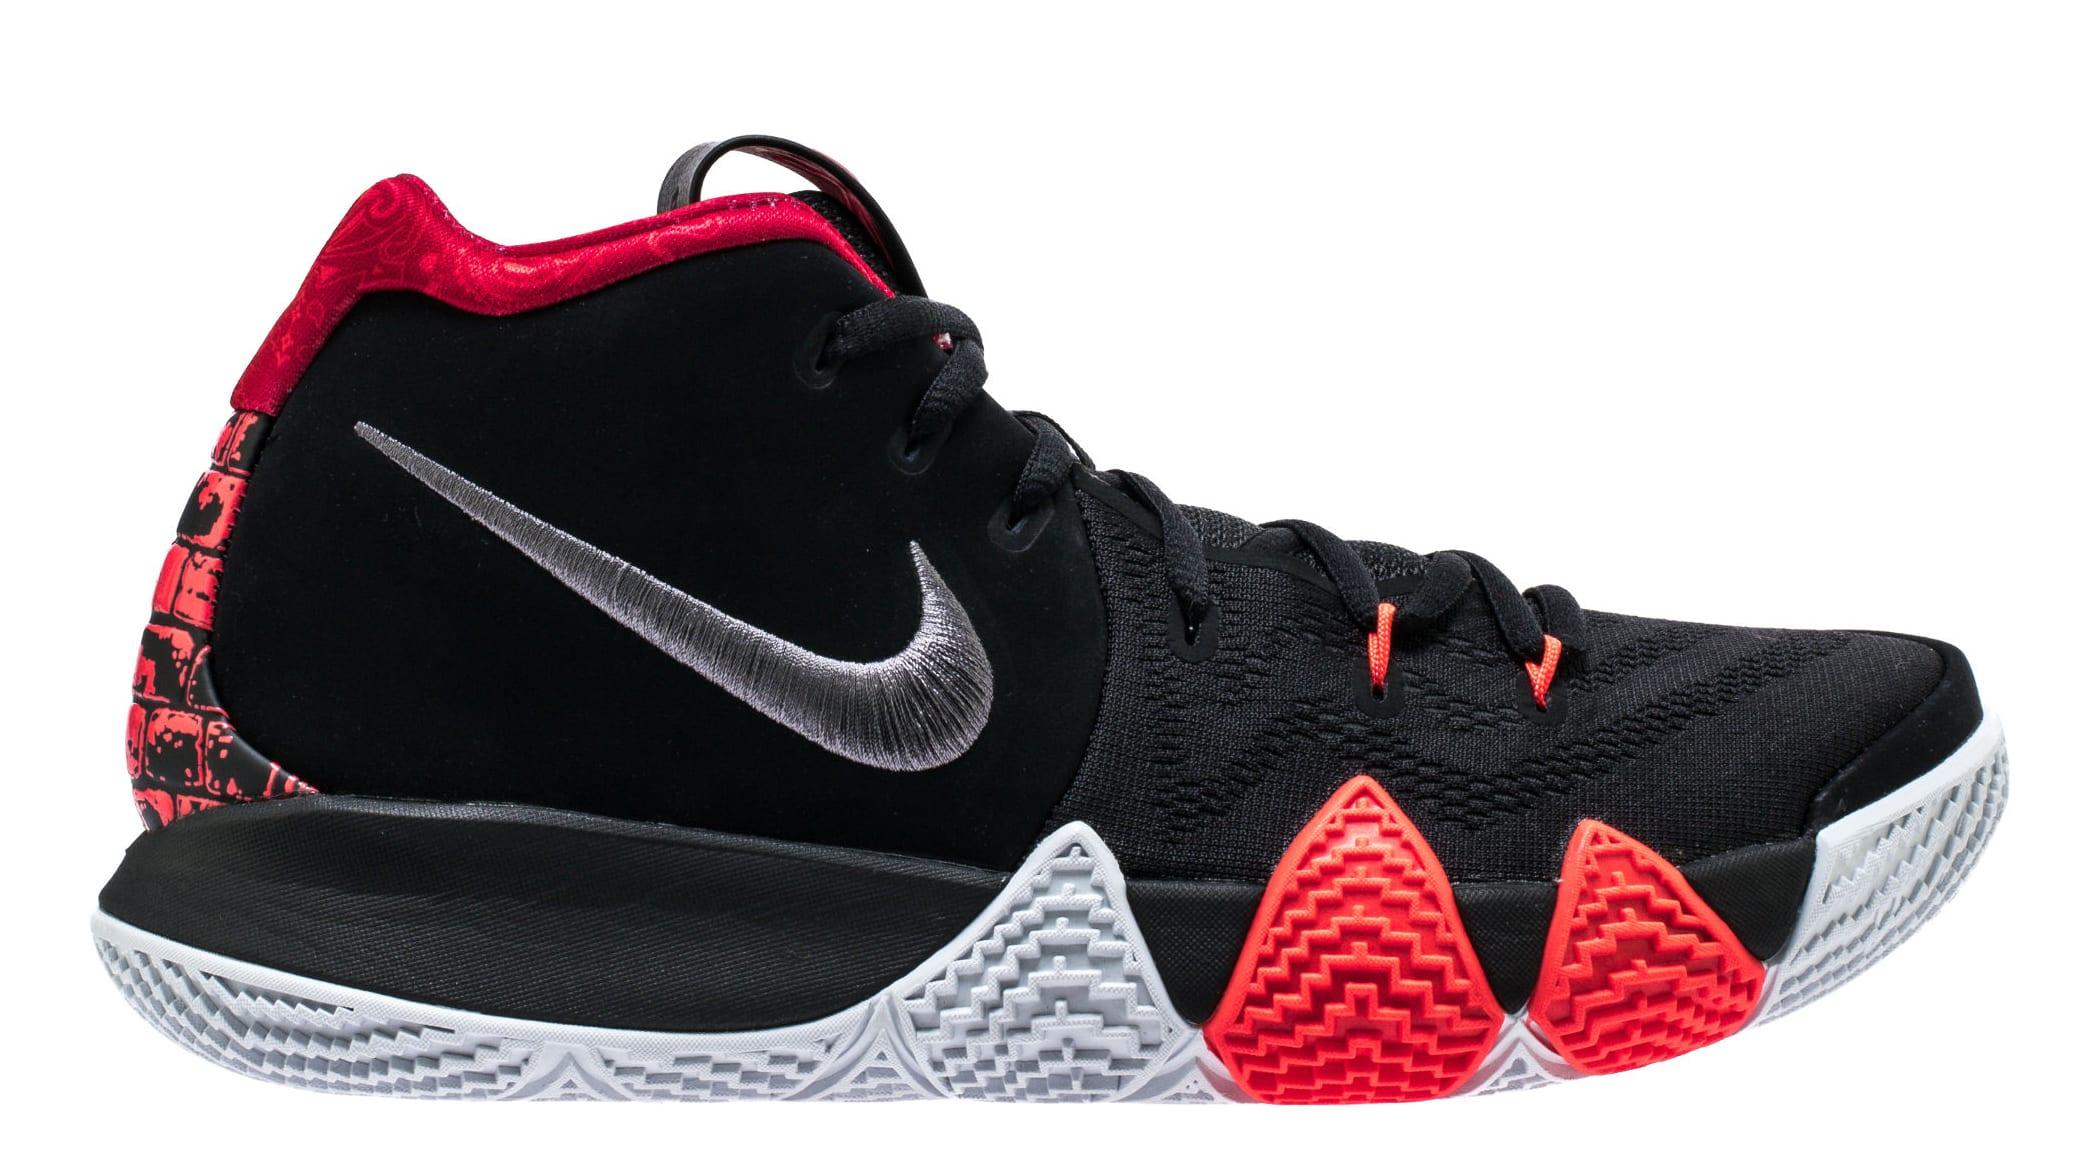 Nike Kyrie 4 'Black/Dark Grey' 943806-005 Release Date | Sole Collector